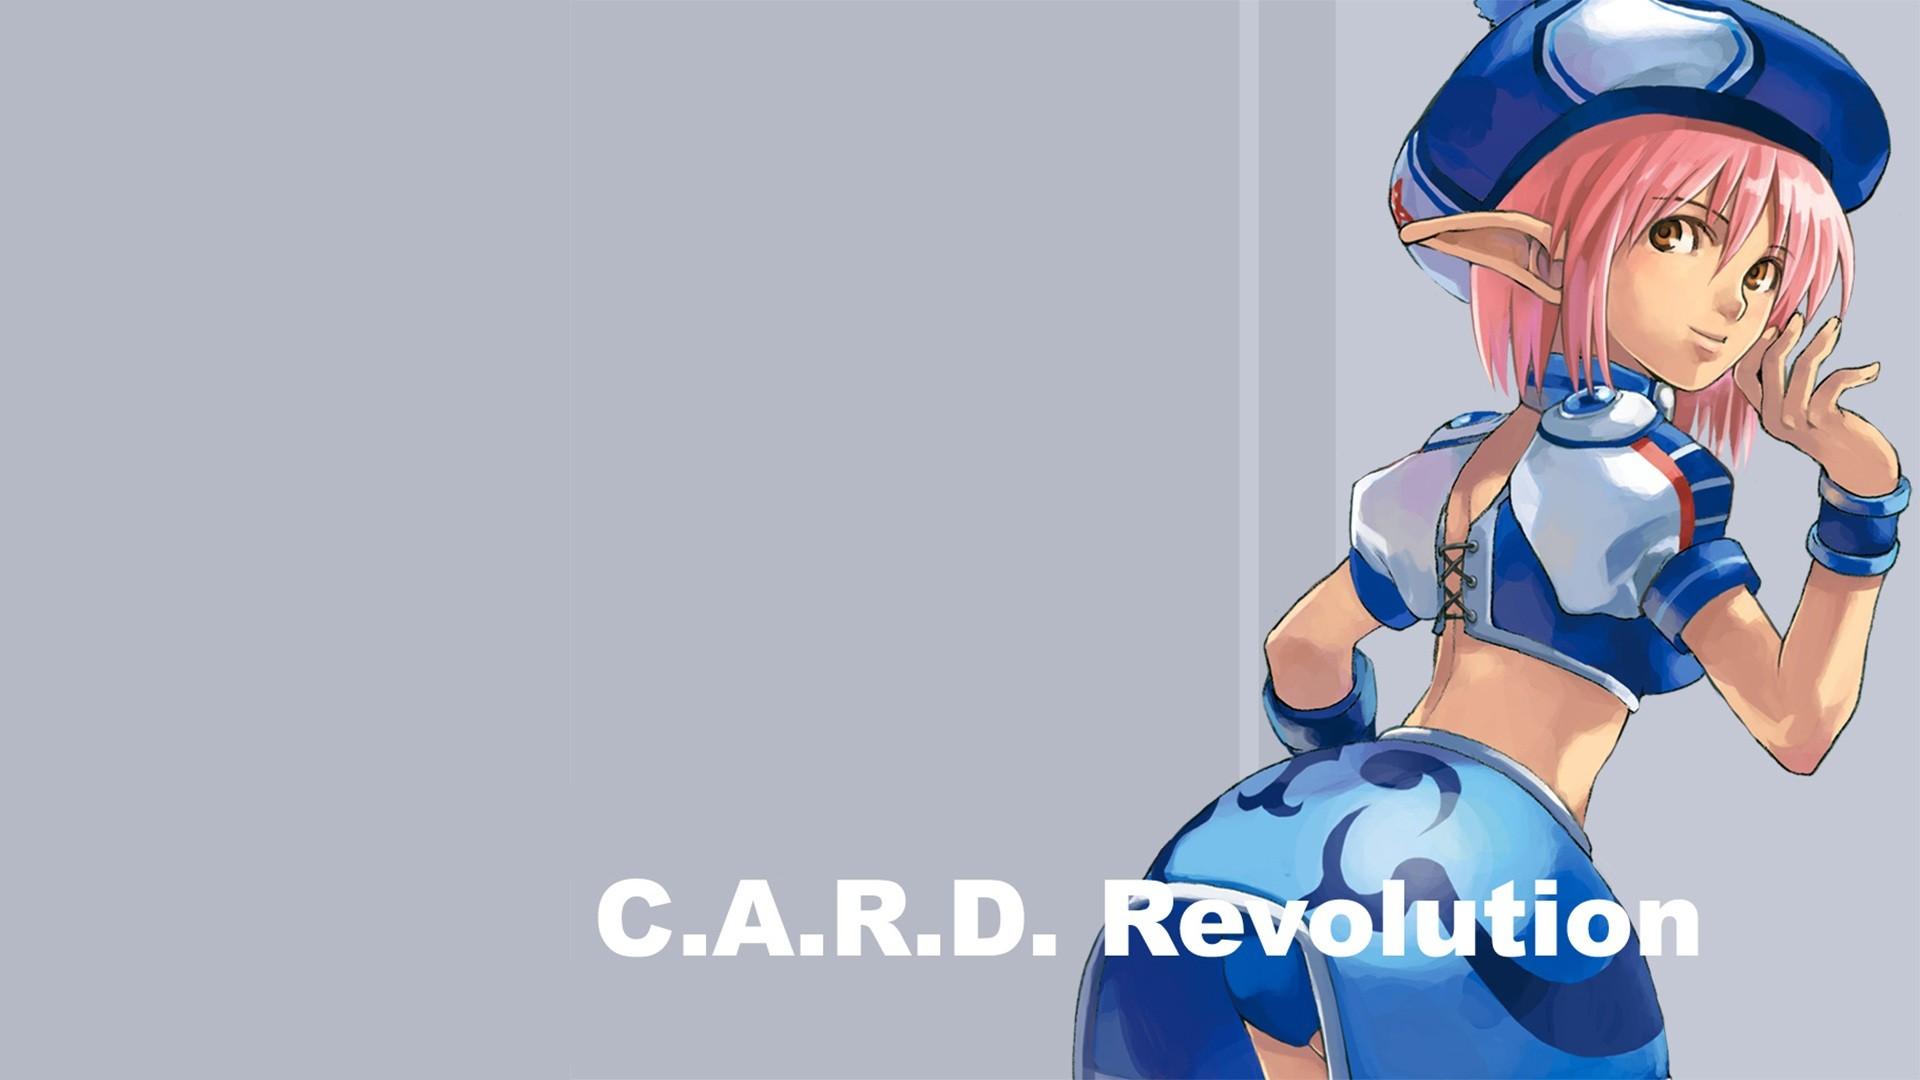 wallpaper : anime, cartoon, phantasy star online 2, figurine